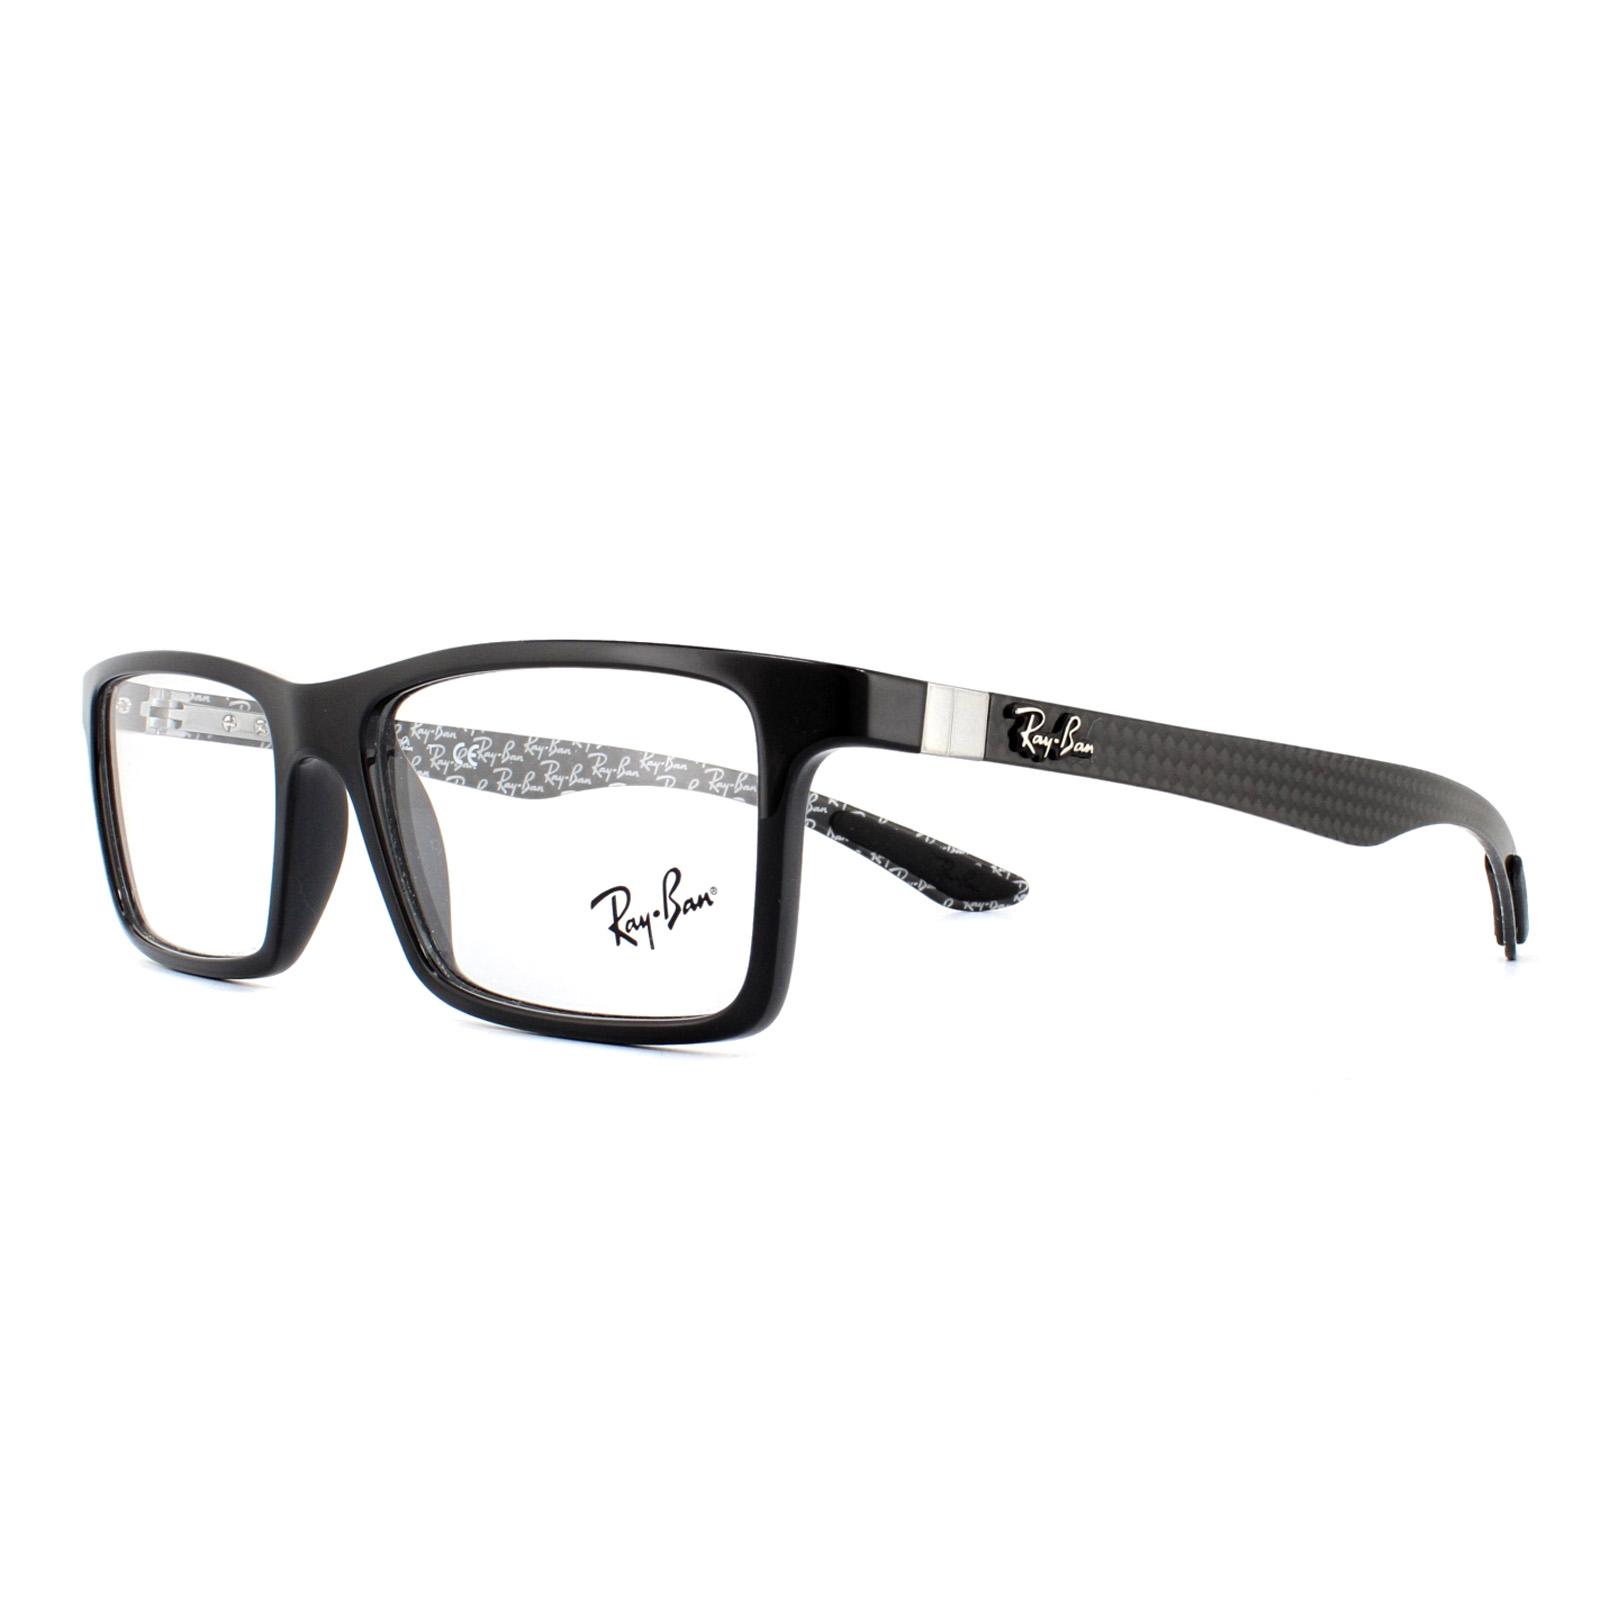 Cheap Ray-Ban 8901 Glasses Frames - Discounted Sunglasses af03d306de70